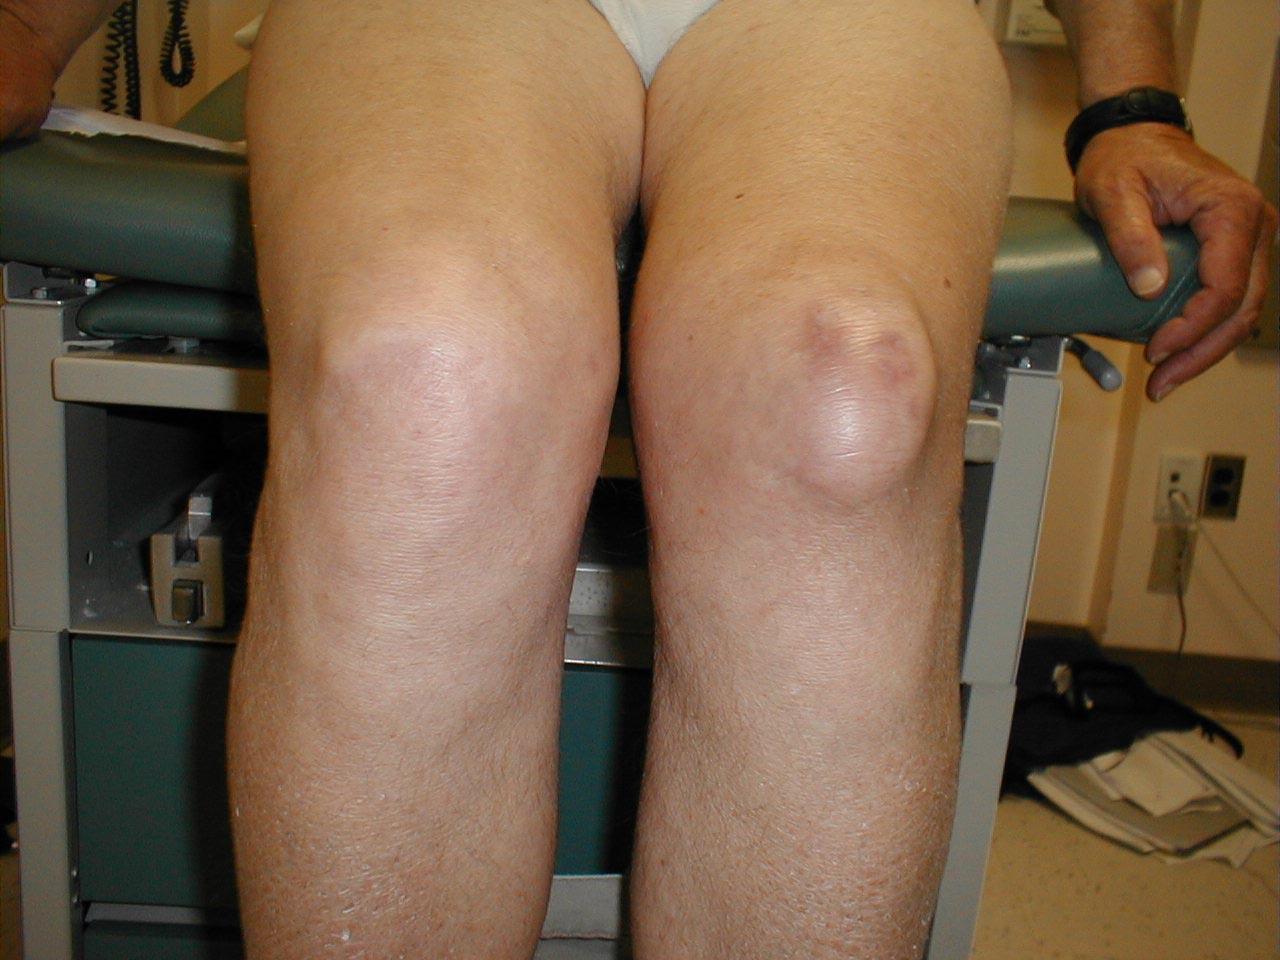 Prepatellar Bursitis of the Knee